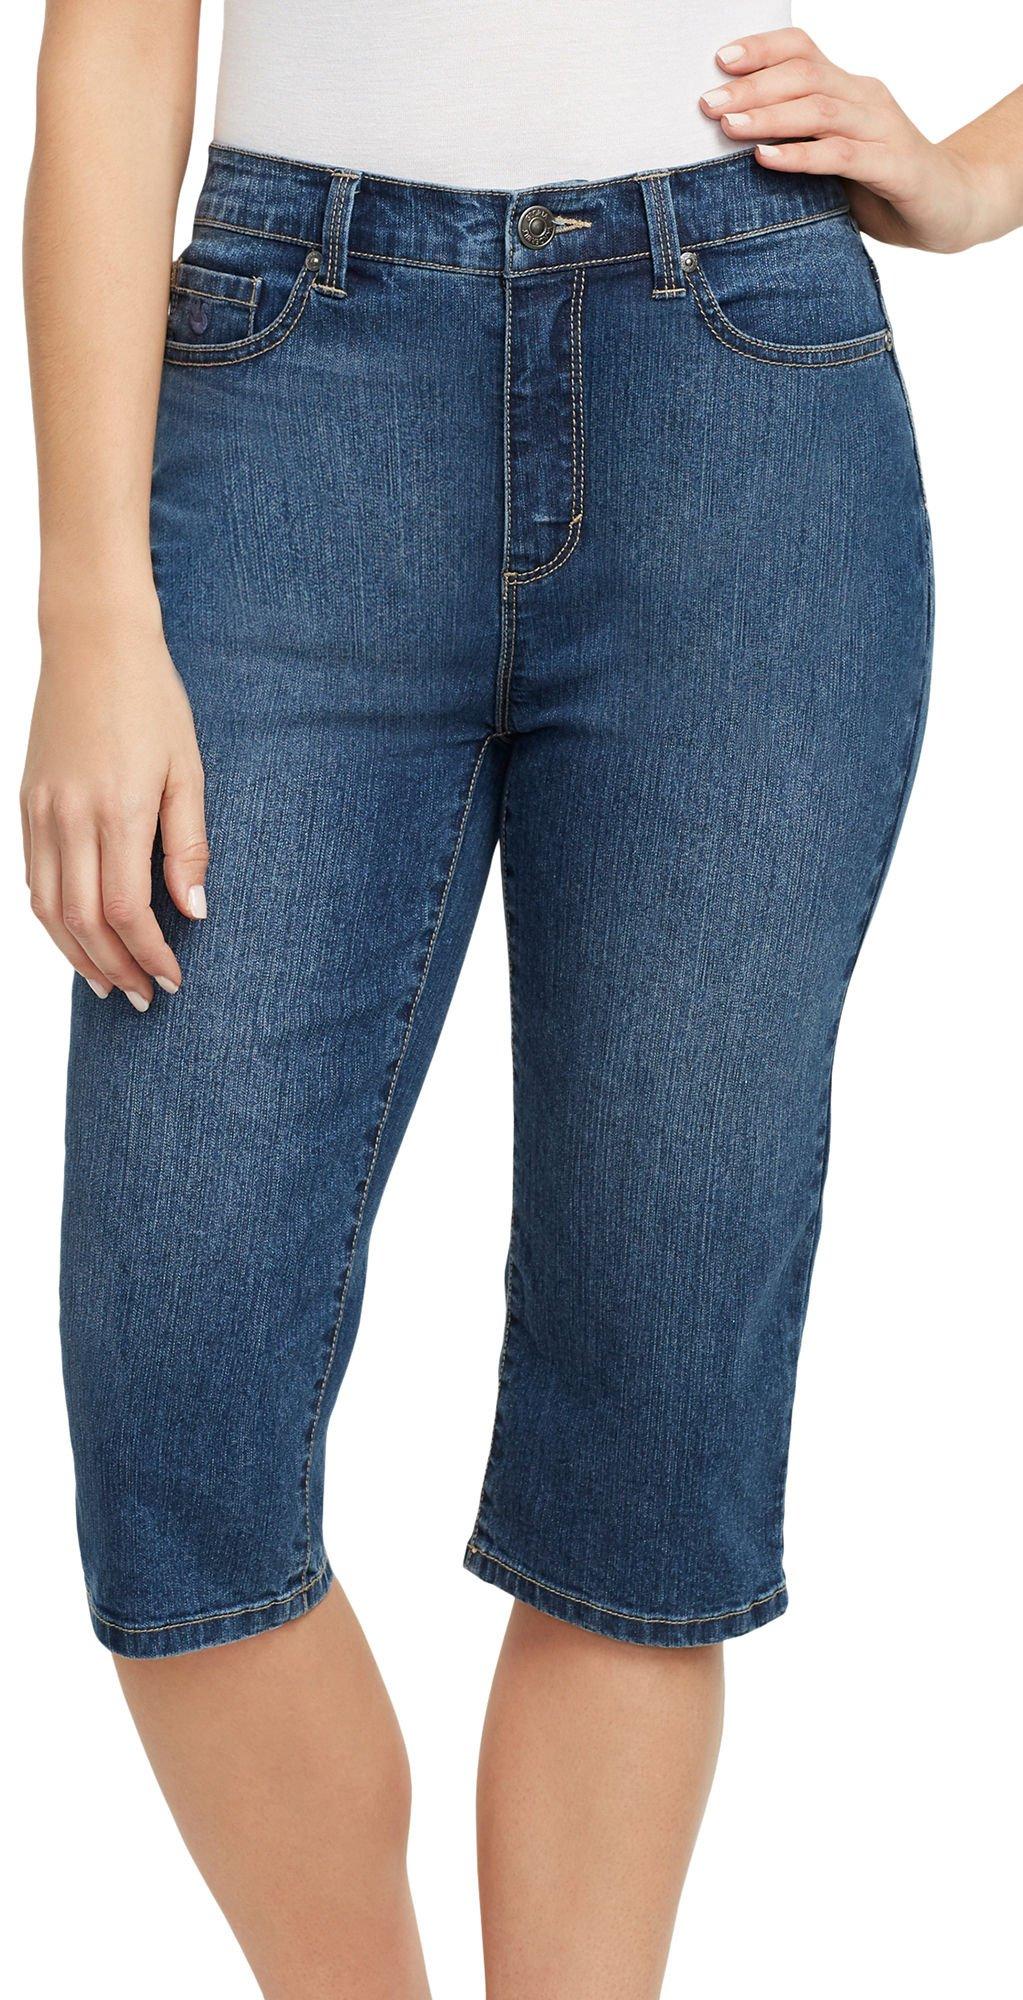 Gloria Vanderbilt Plus Amanda Skimmers Embellished Shorts 12P Venice Blue